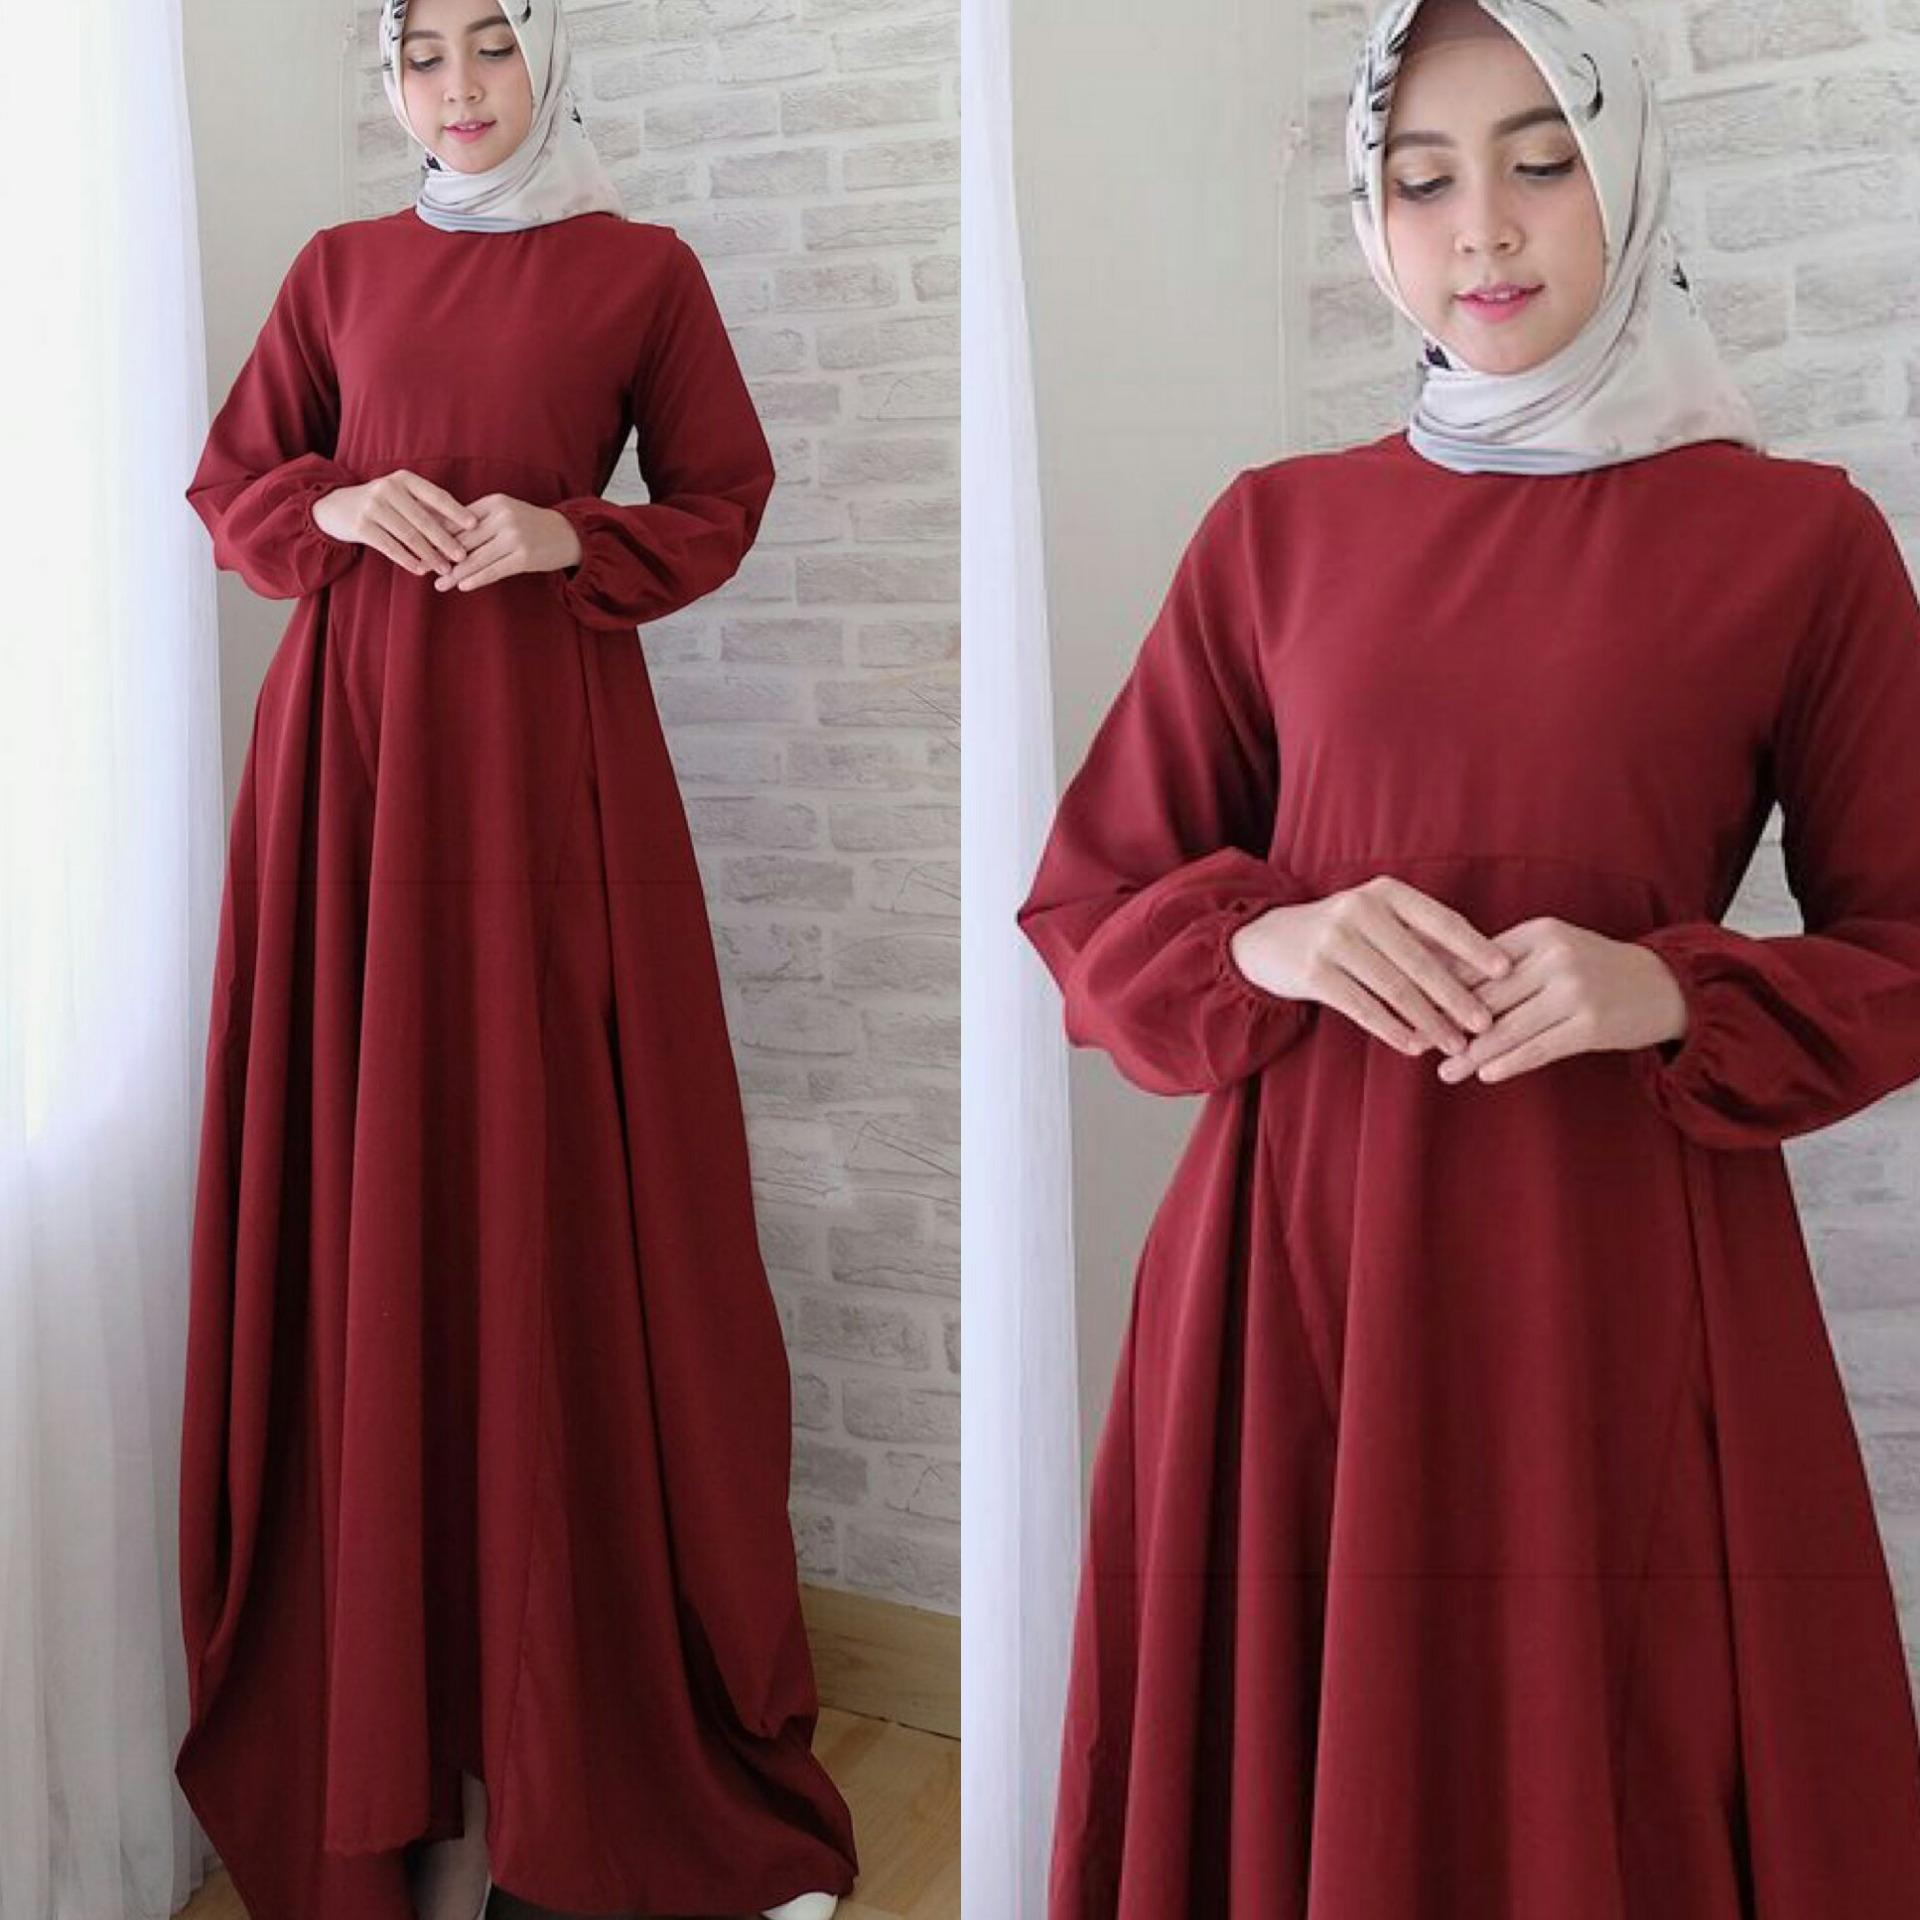 Promo Toko Snowshop Fashion Muslim Gamis Syari Camilace Merah Maroon